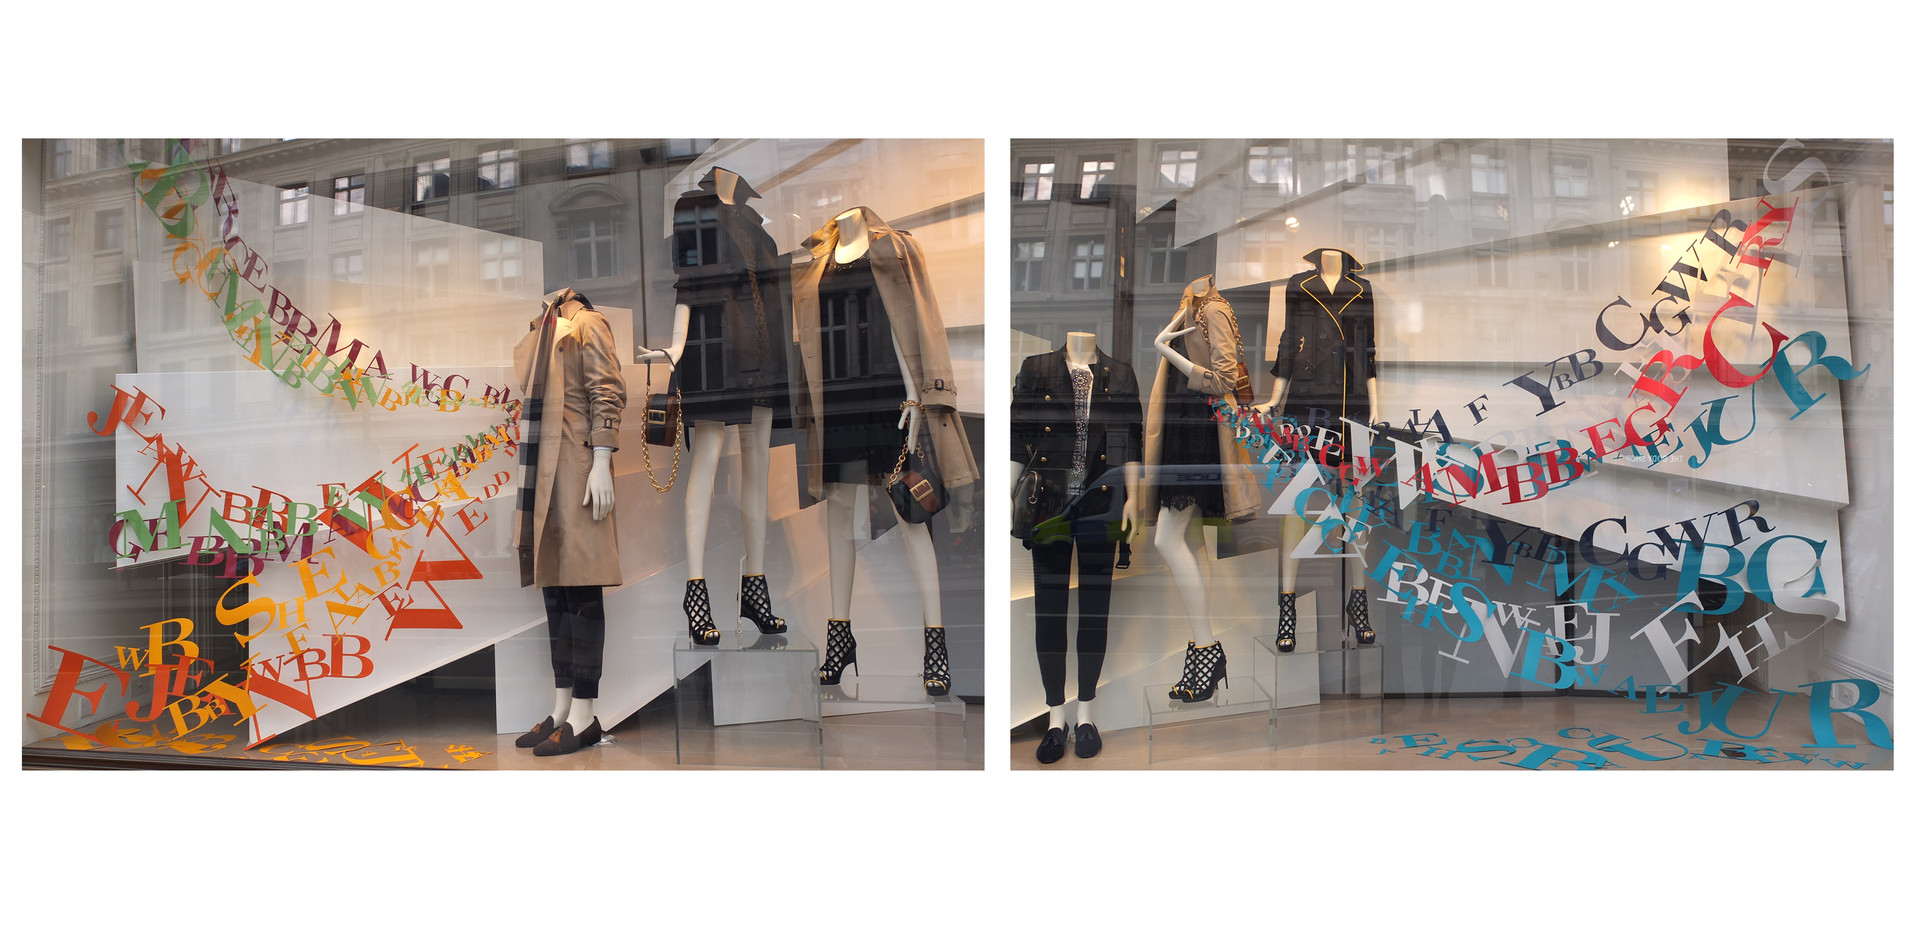 Burberry, Regent street flagship store window display, Feb 2016